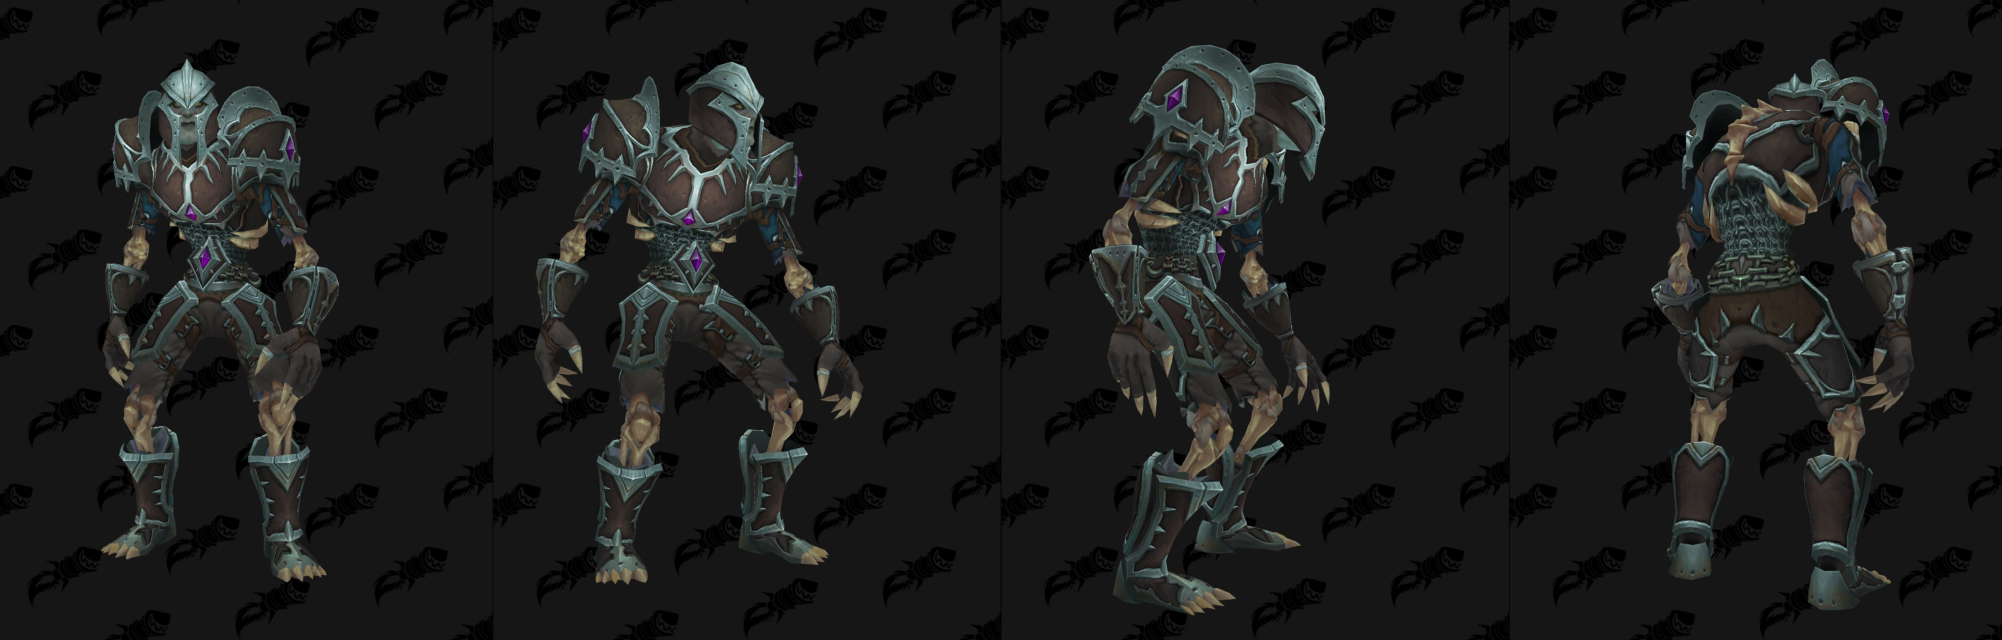 Armure Plaques Horde - Front de guerre Sombrivage Tier 1